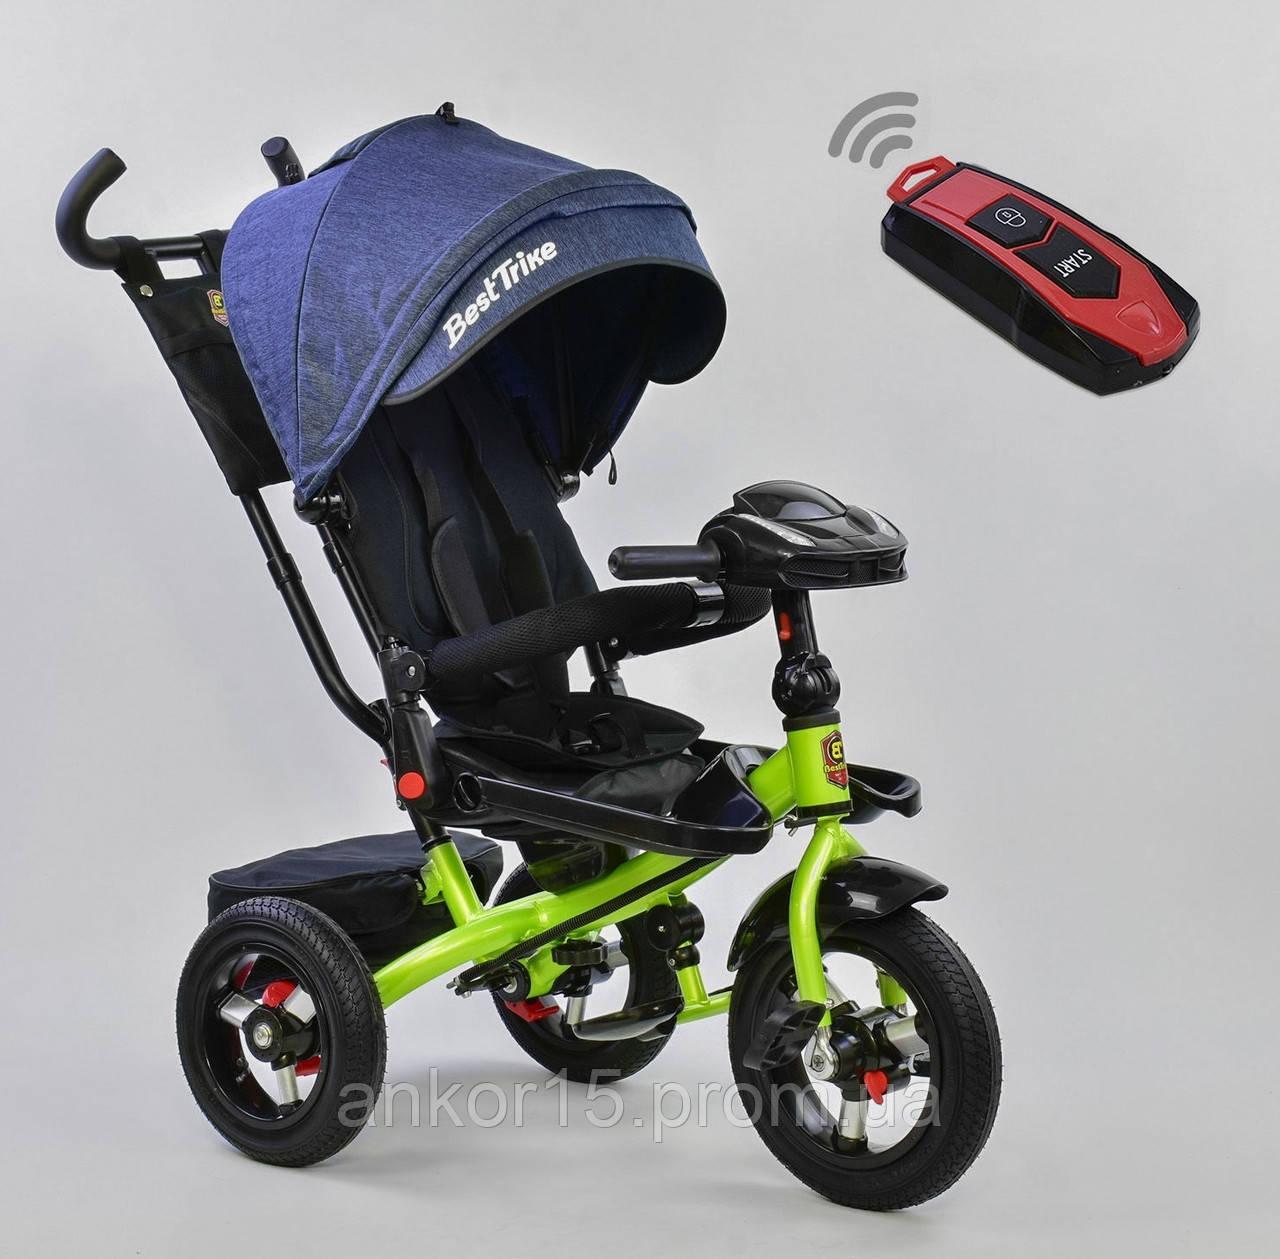 Детский трехколесный велосипед Best Trike 6088 F 1780 New Blue-Lime Green